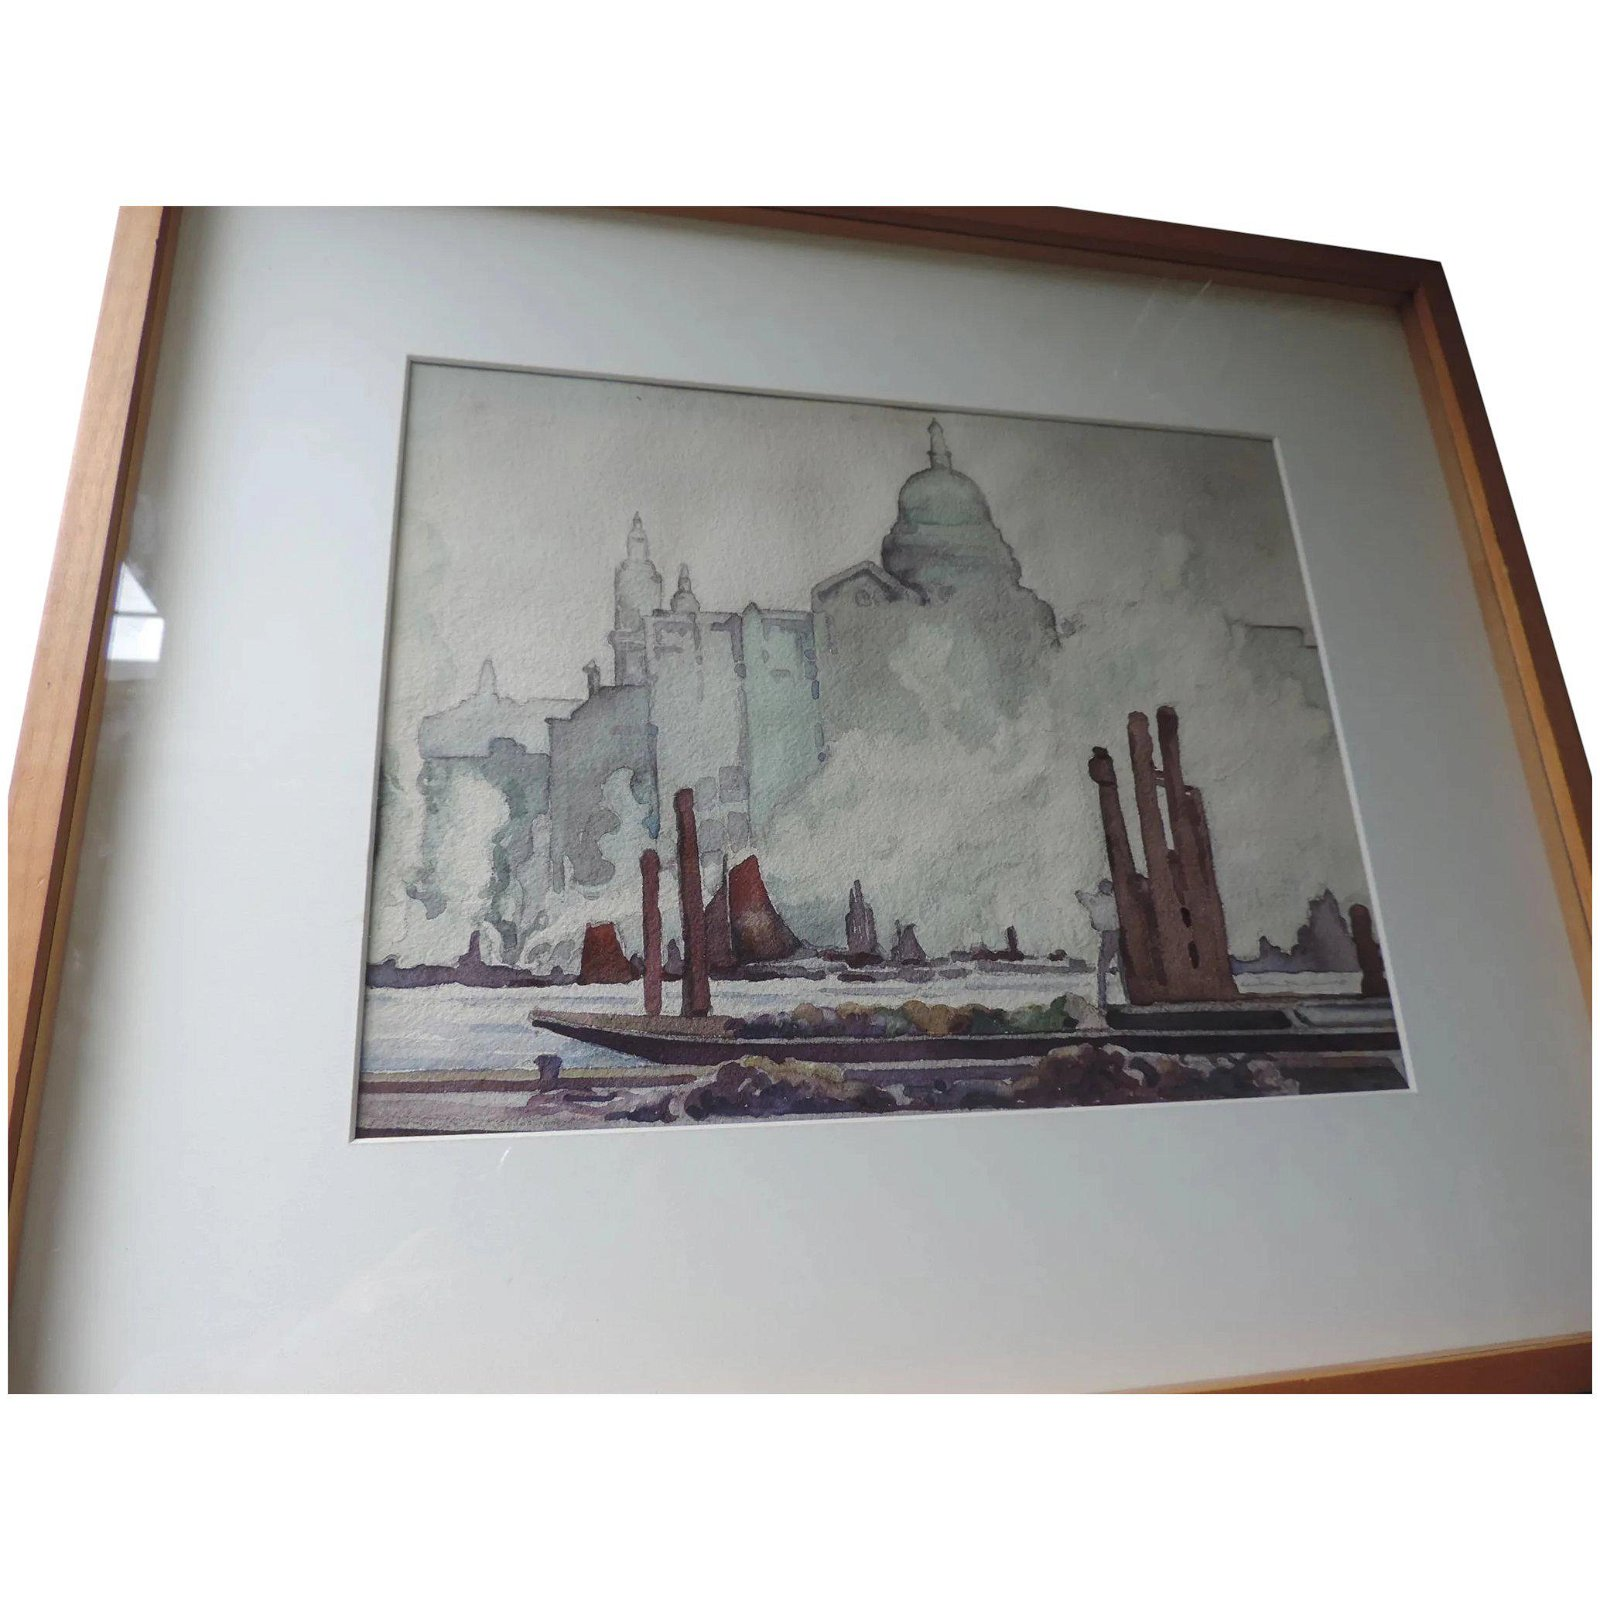 "Watercolor, Venice, Italy, 1945, 10"" X 13"", Framed"